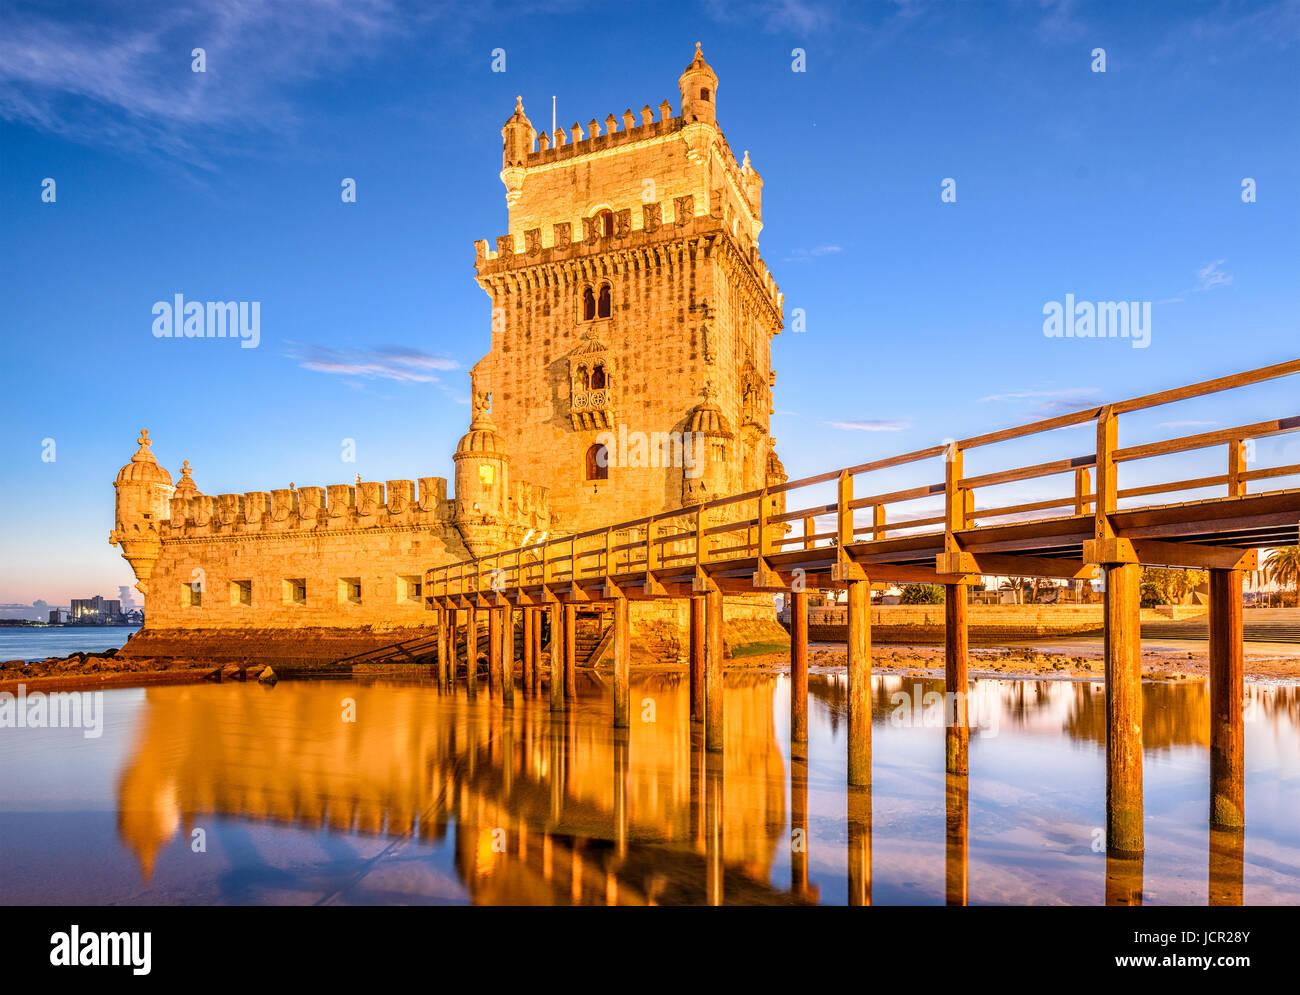 Torre de Belem en el río Tajo en Lisboa, Portugal. Imagen De Stock